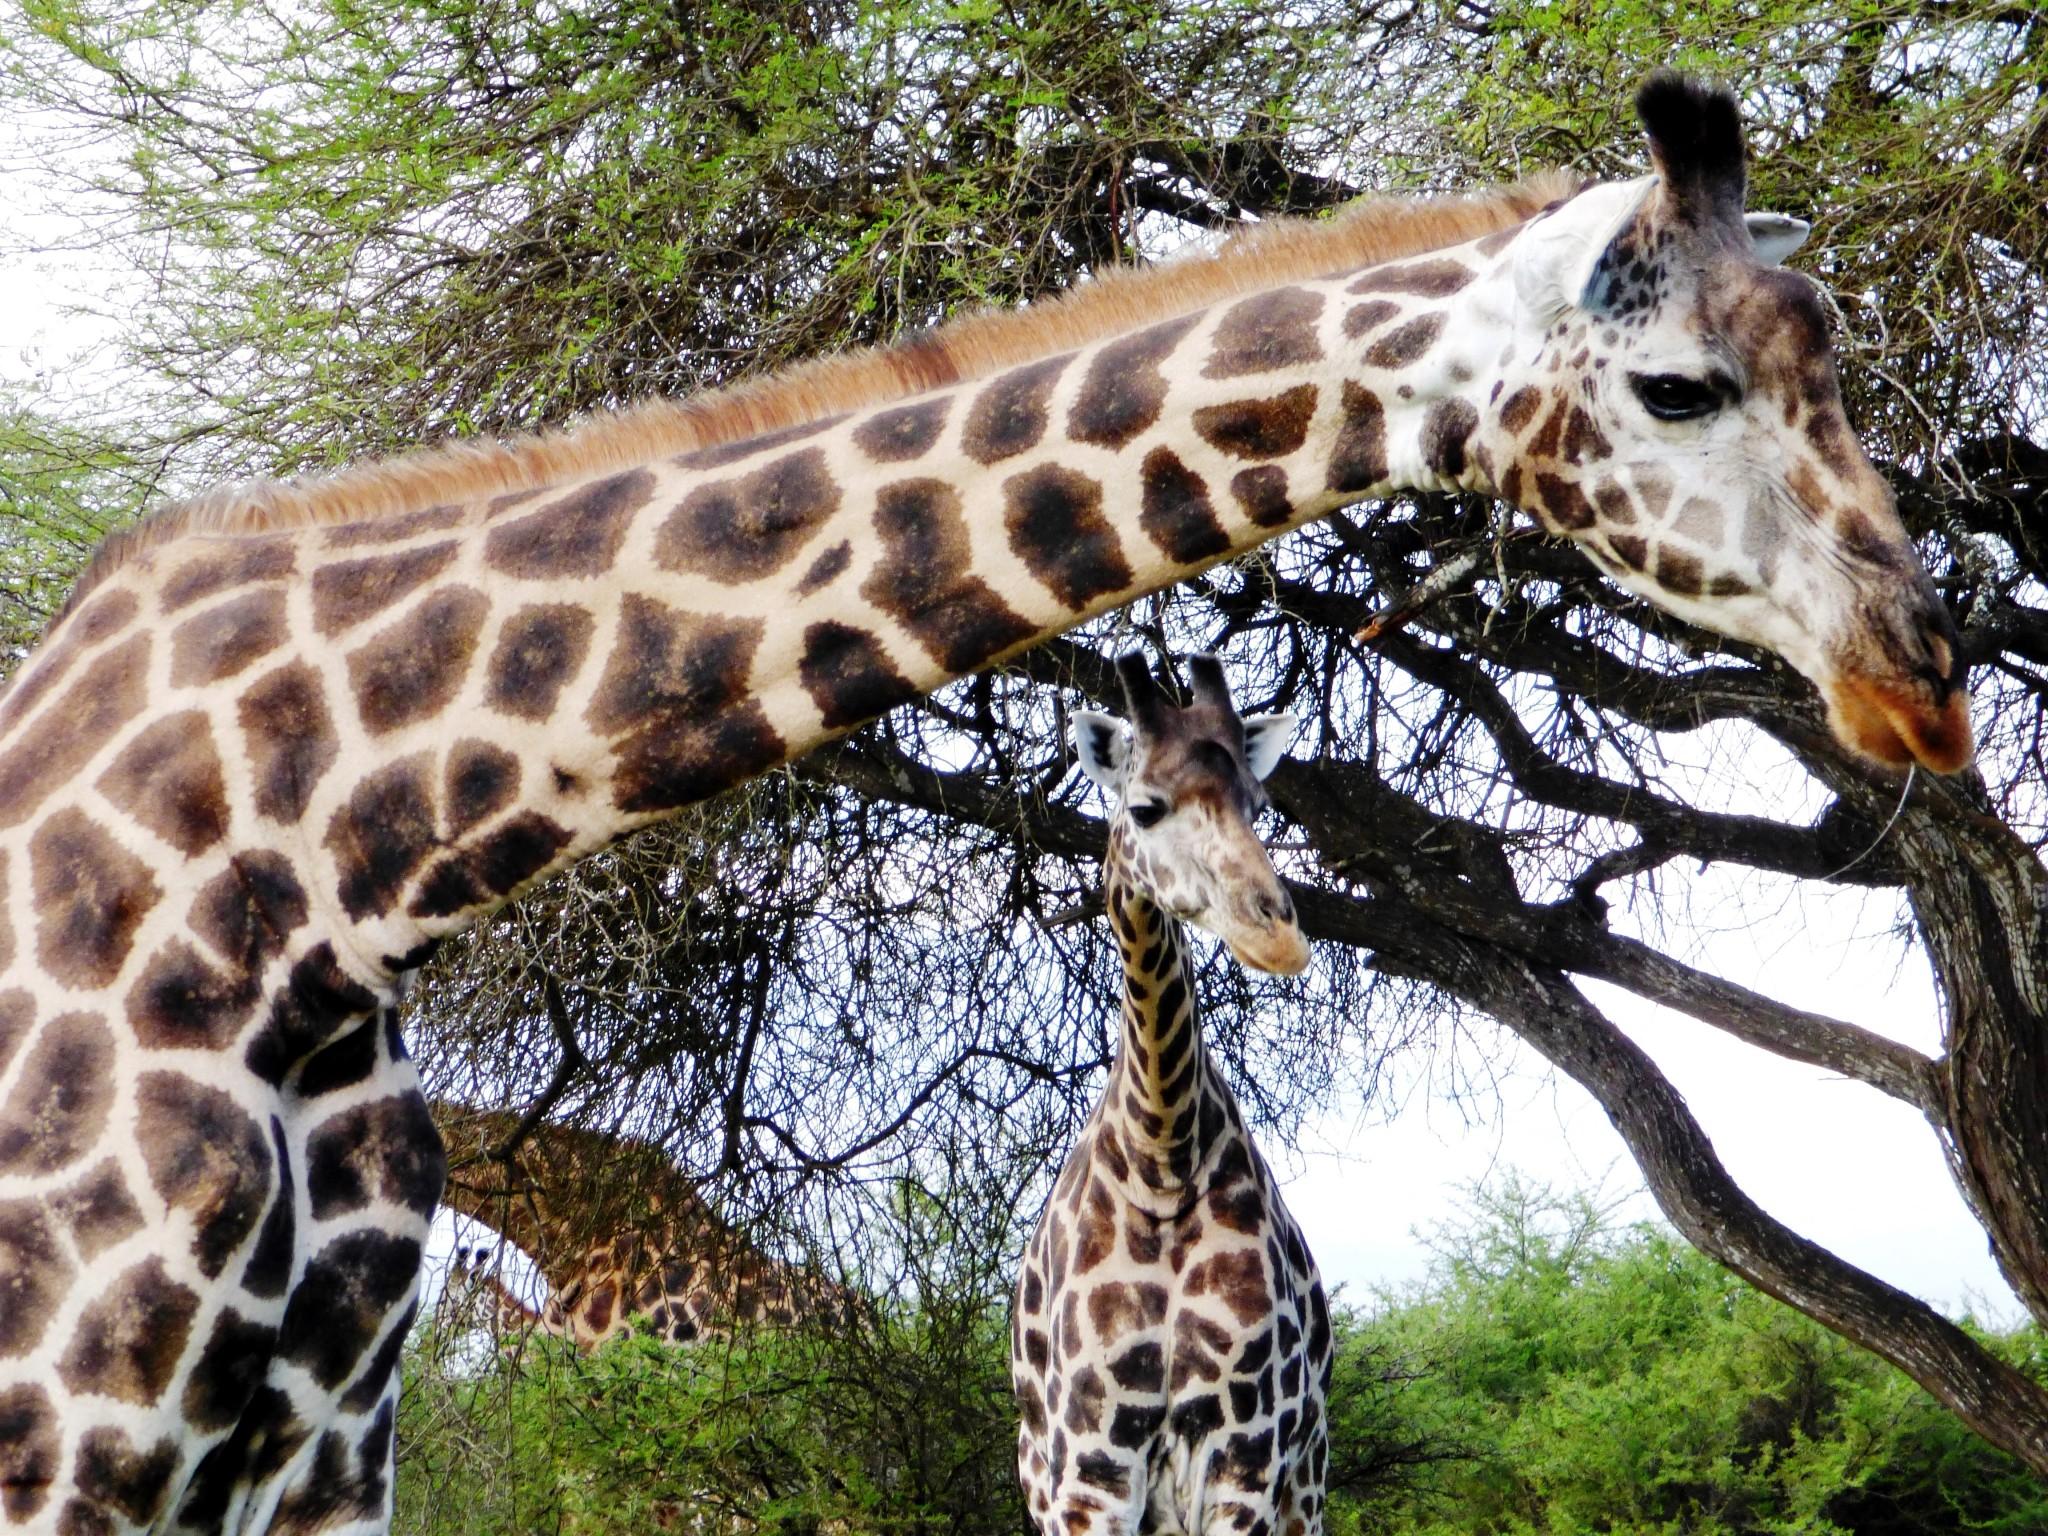 Kundenfeedback zu individueller Kenia Safari Reise